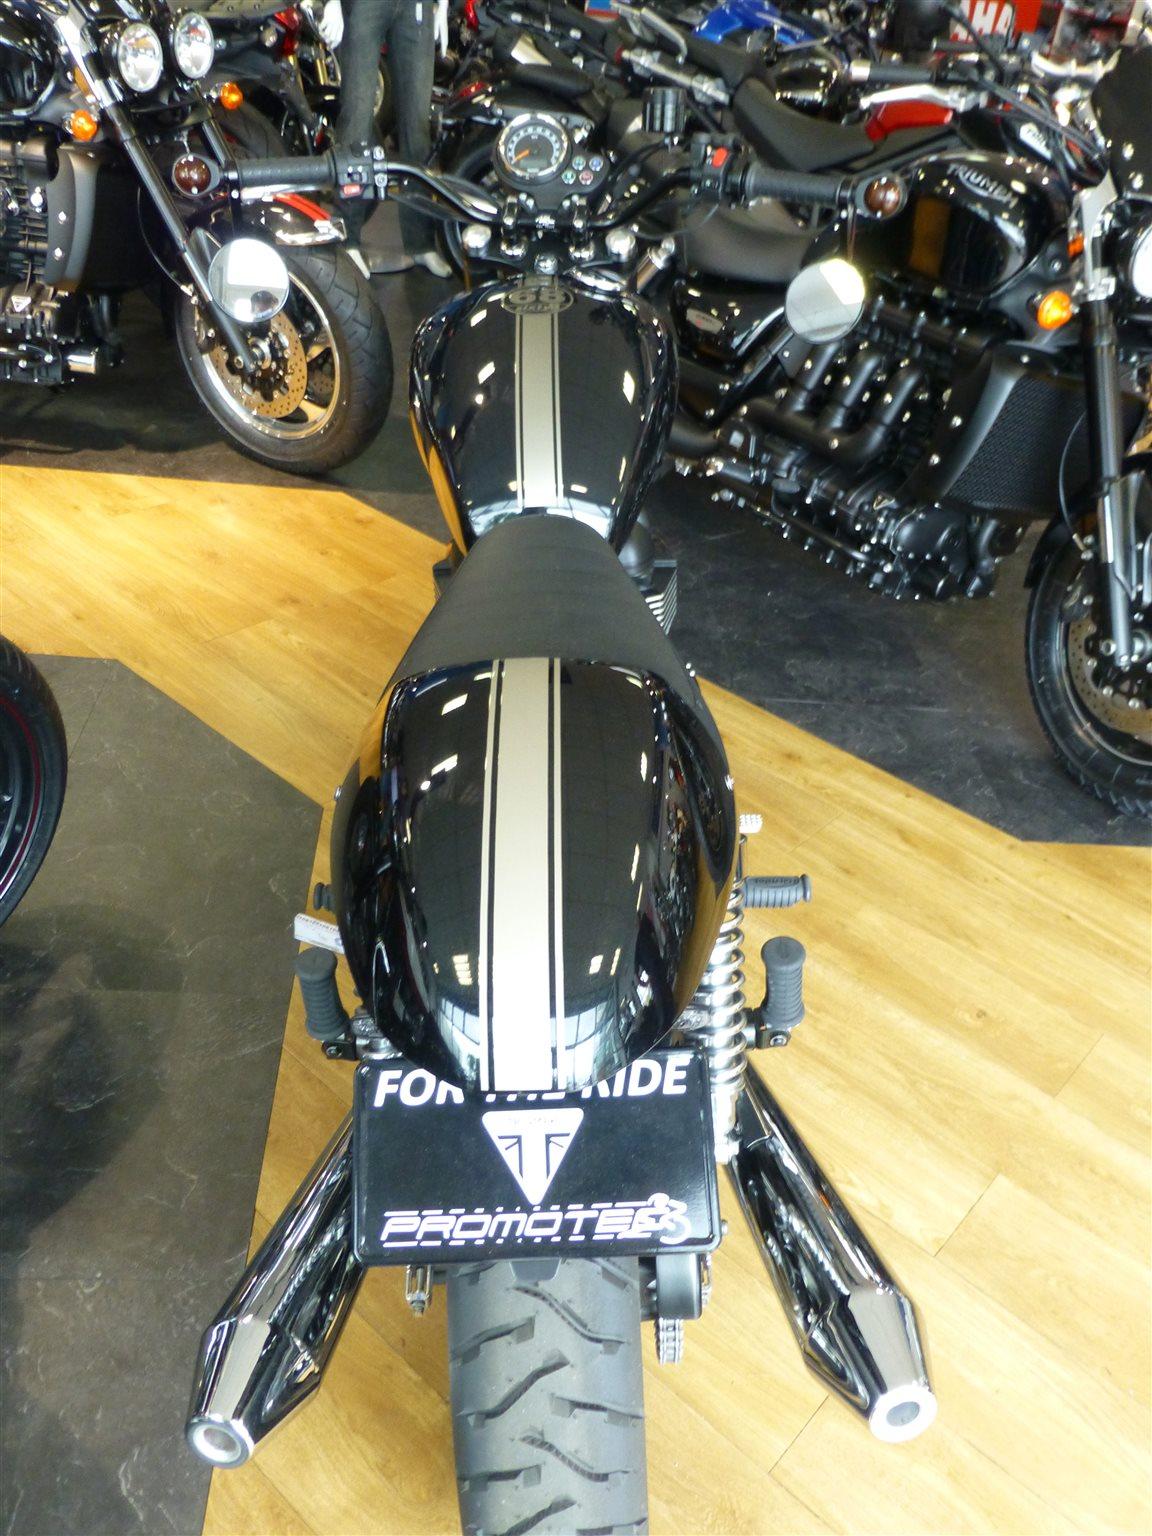 umgebautes motorrad triumph bonneville t100 von promotec. Black Bedroom Furniture Sets. Home Design Ideas